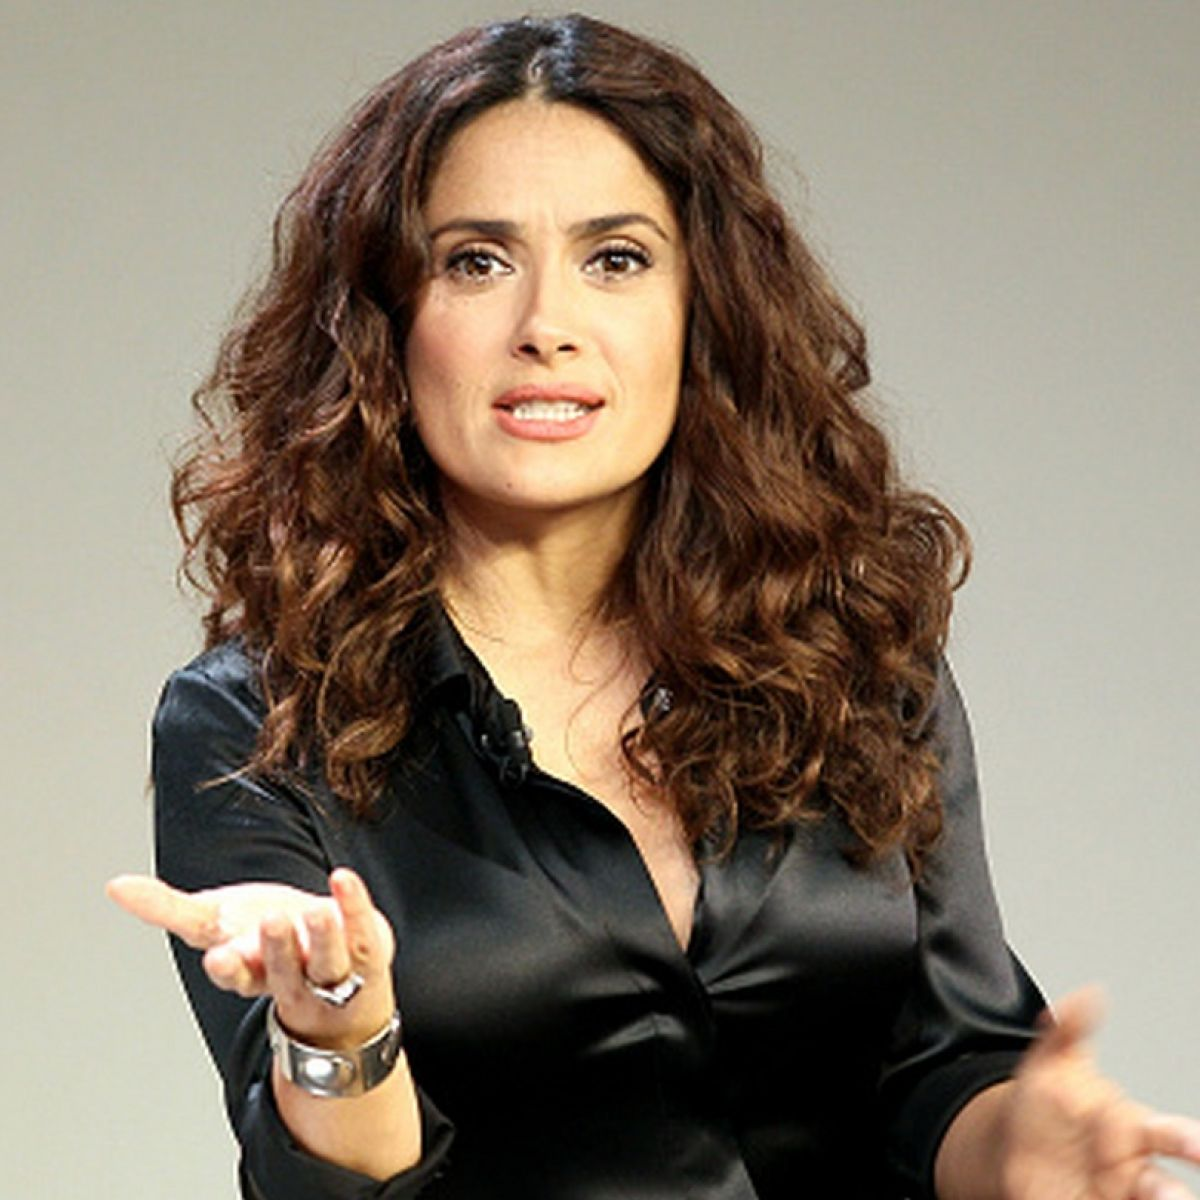 Angela Molina Sexy salma hayek: 'if i was a white man, i would be bigger than